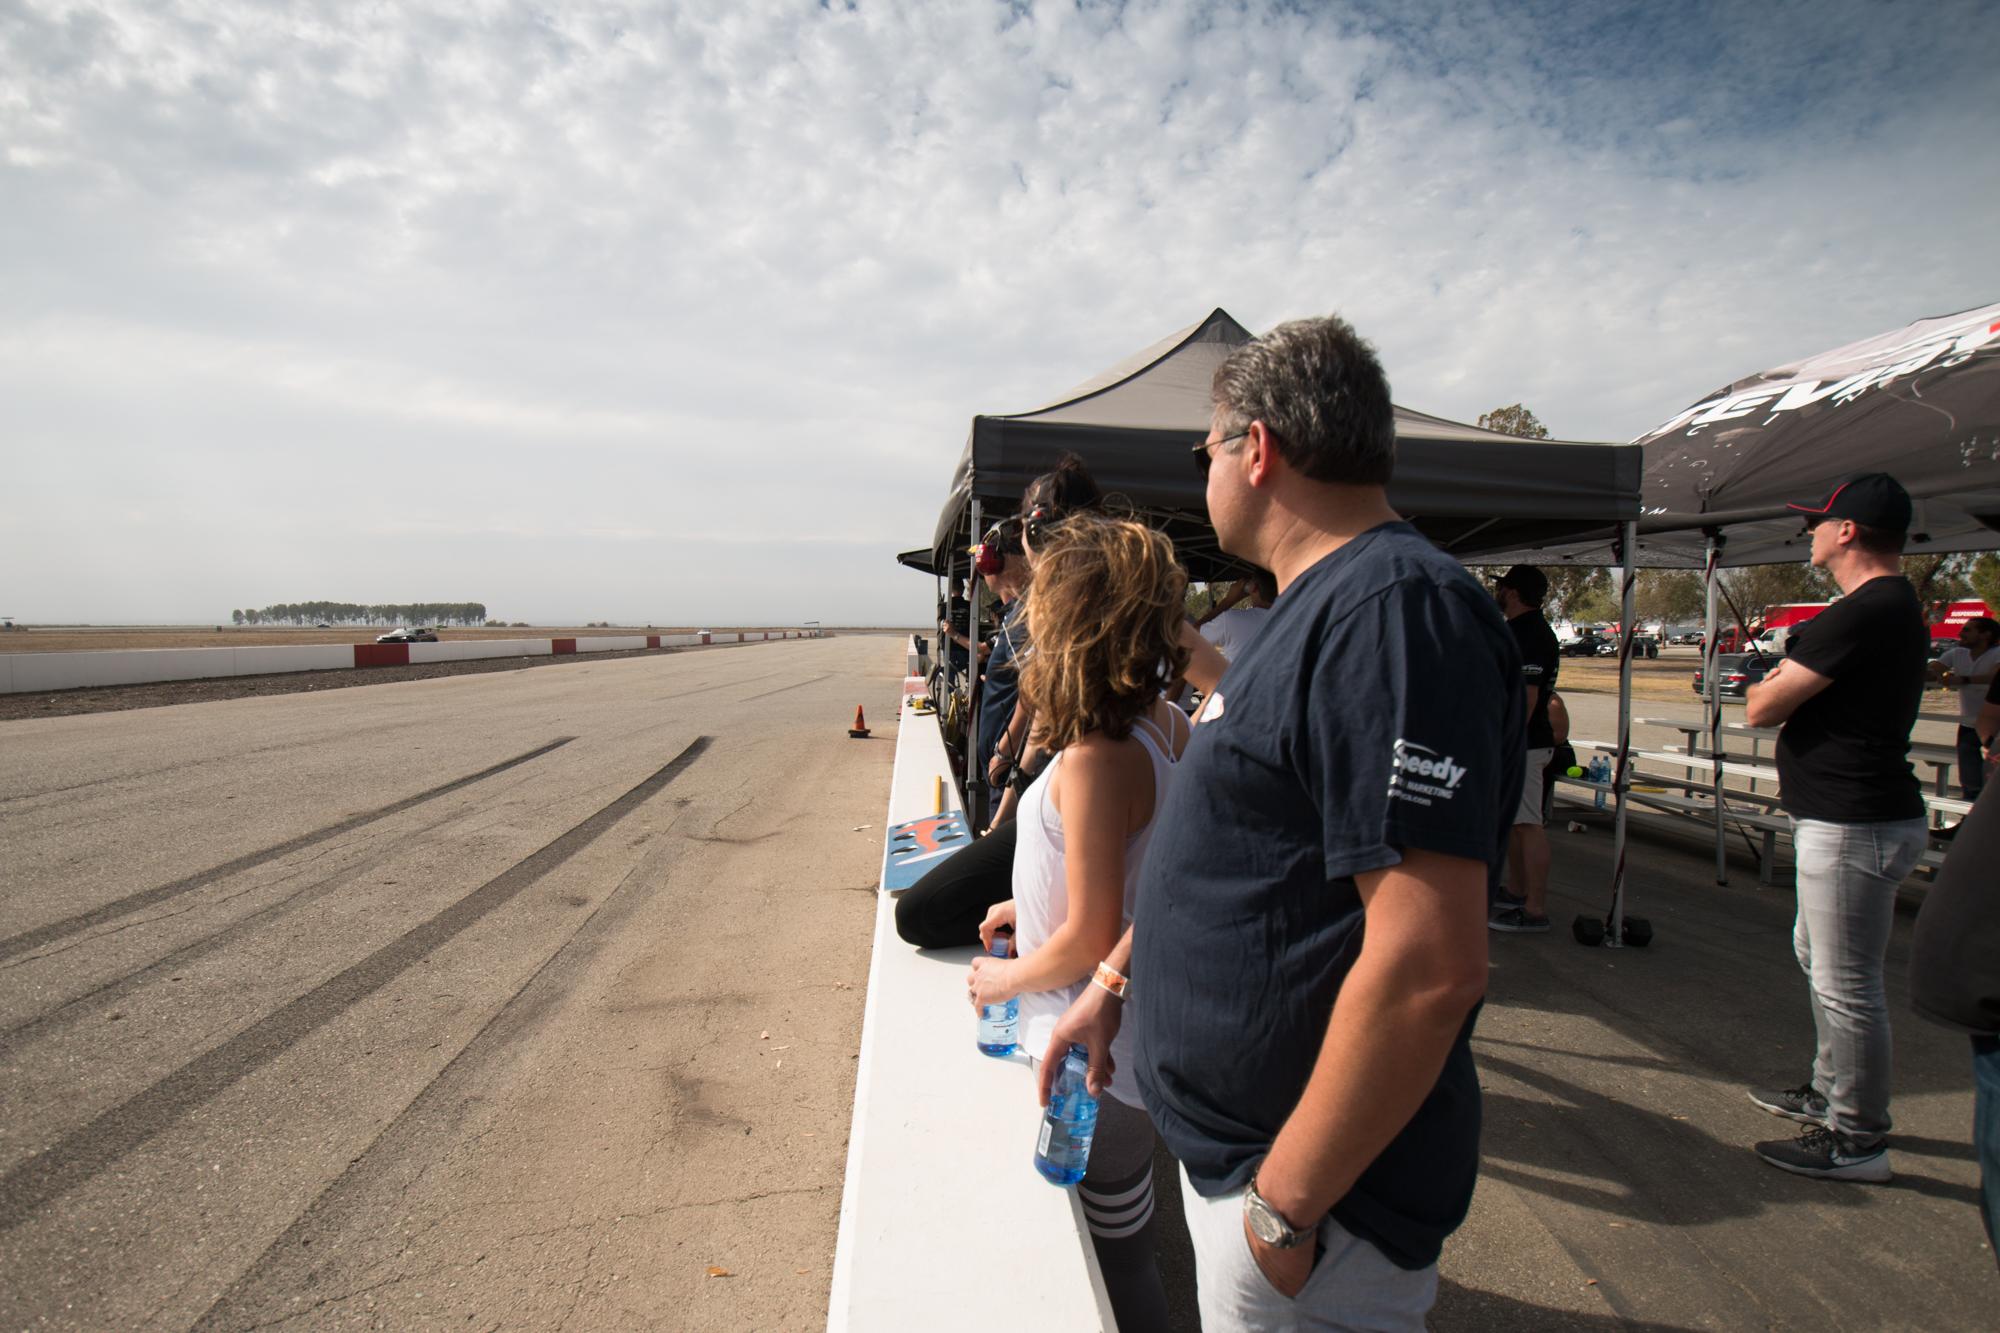 Steven-Racing-20130301-55543.jpg